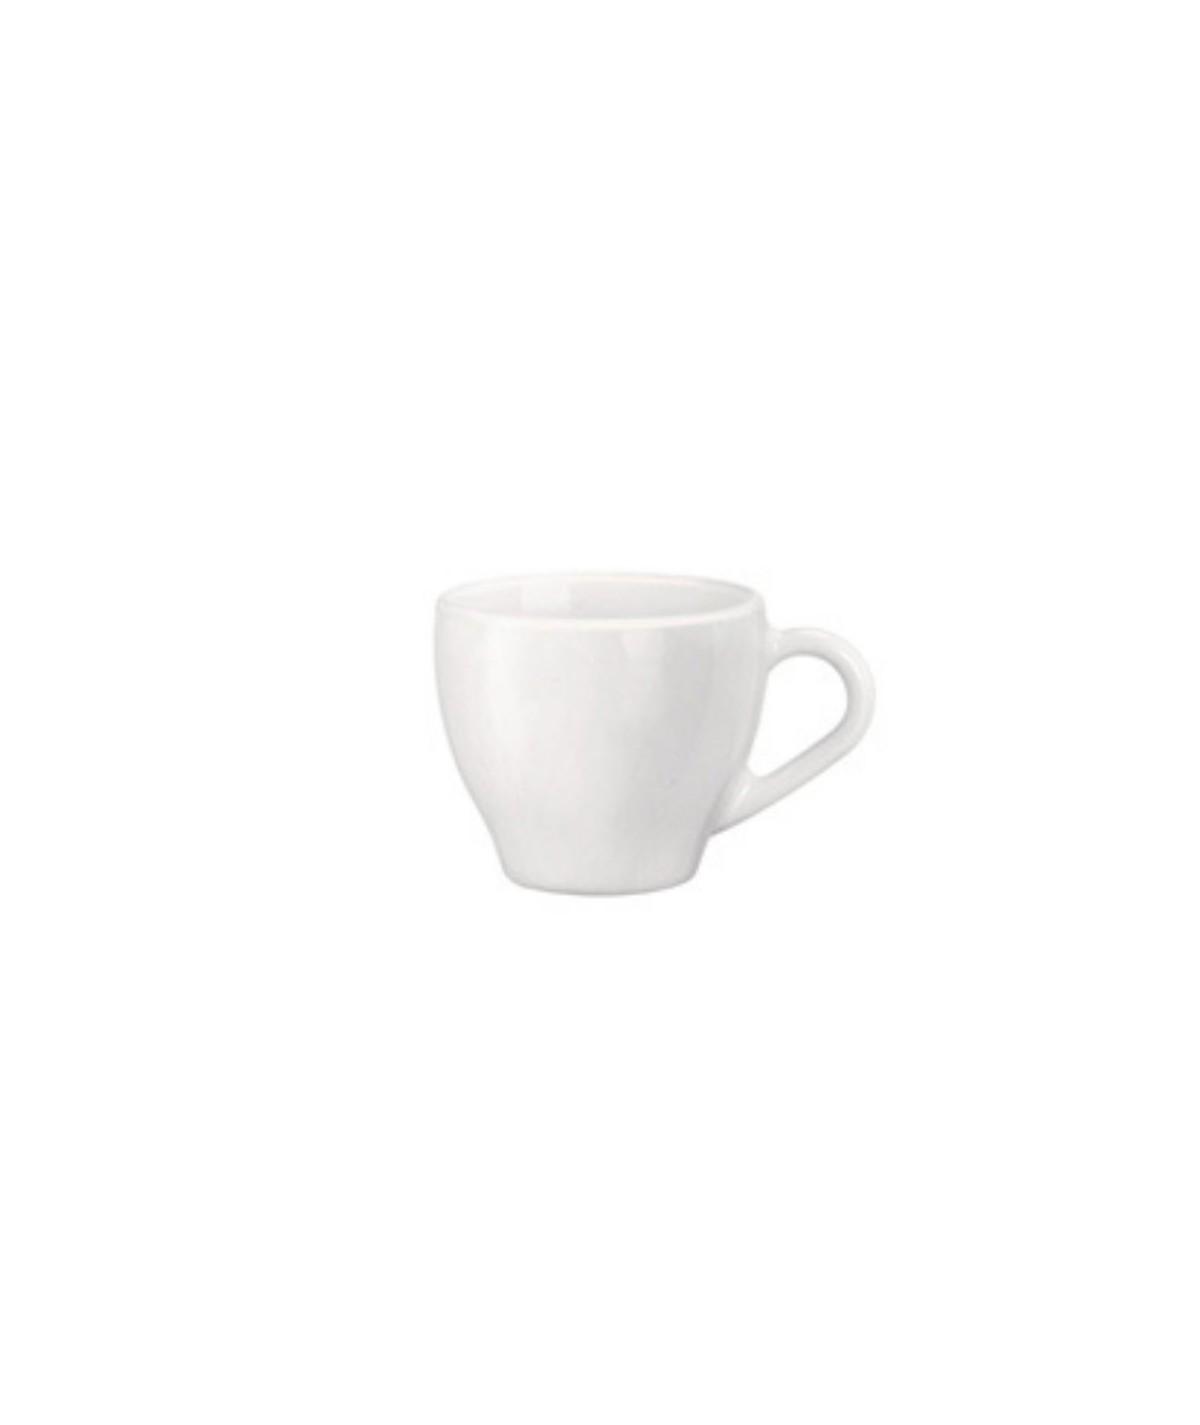 Tazzina bianca caffè...